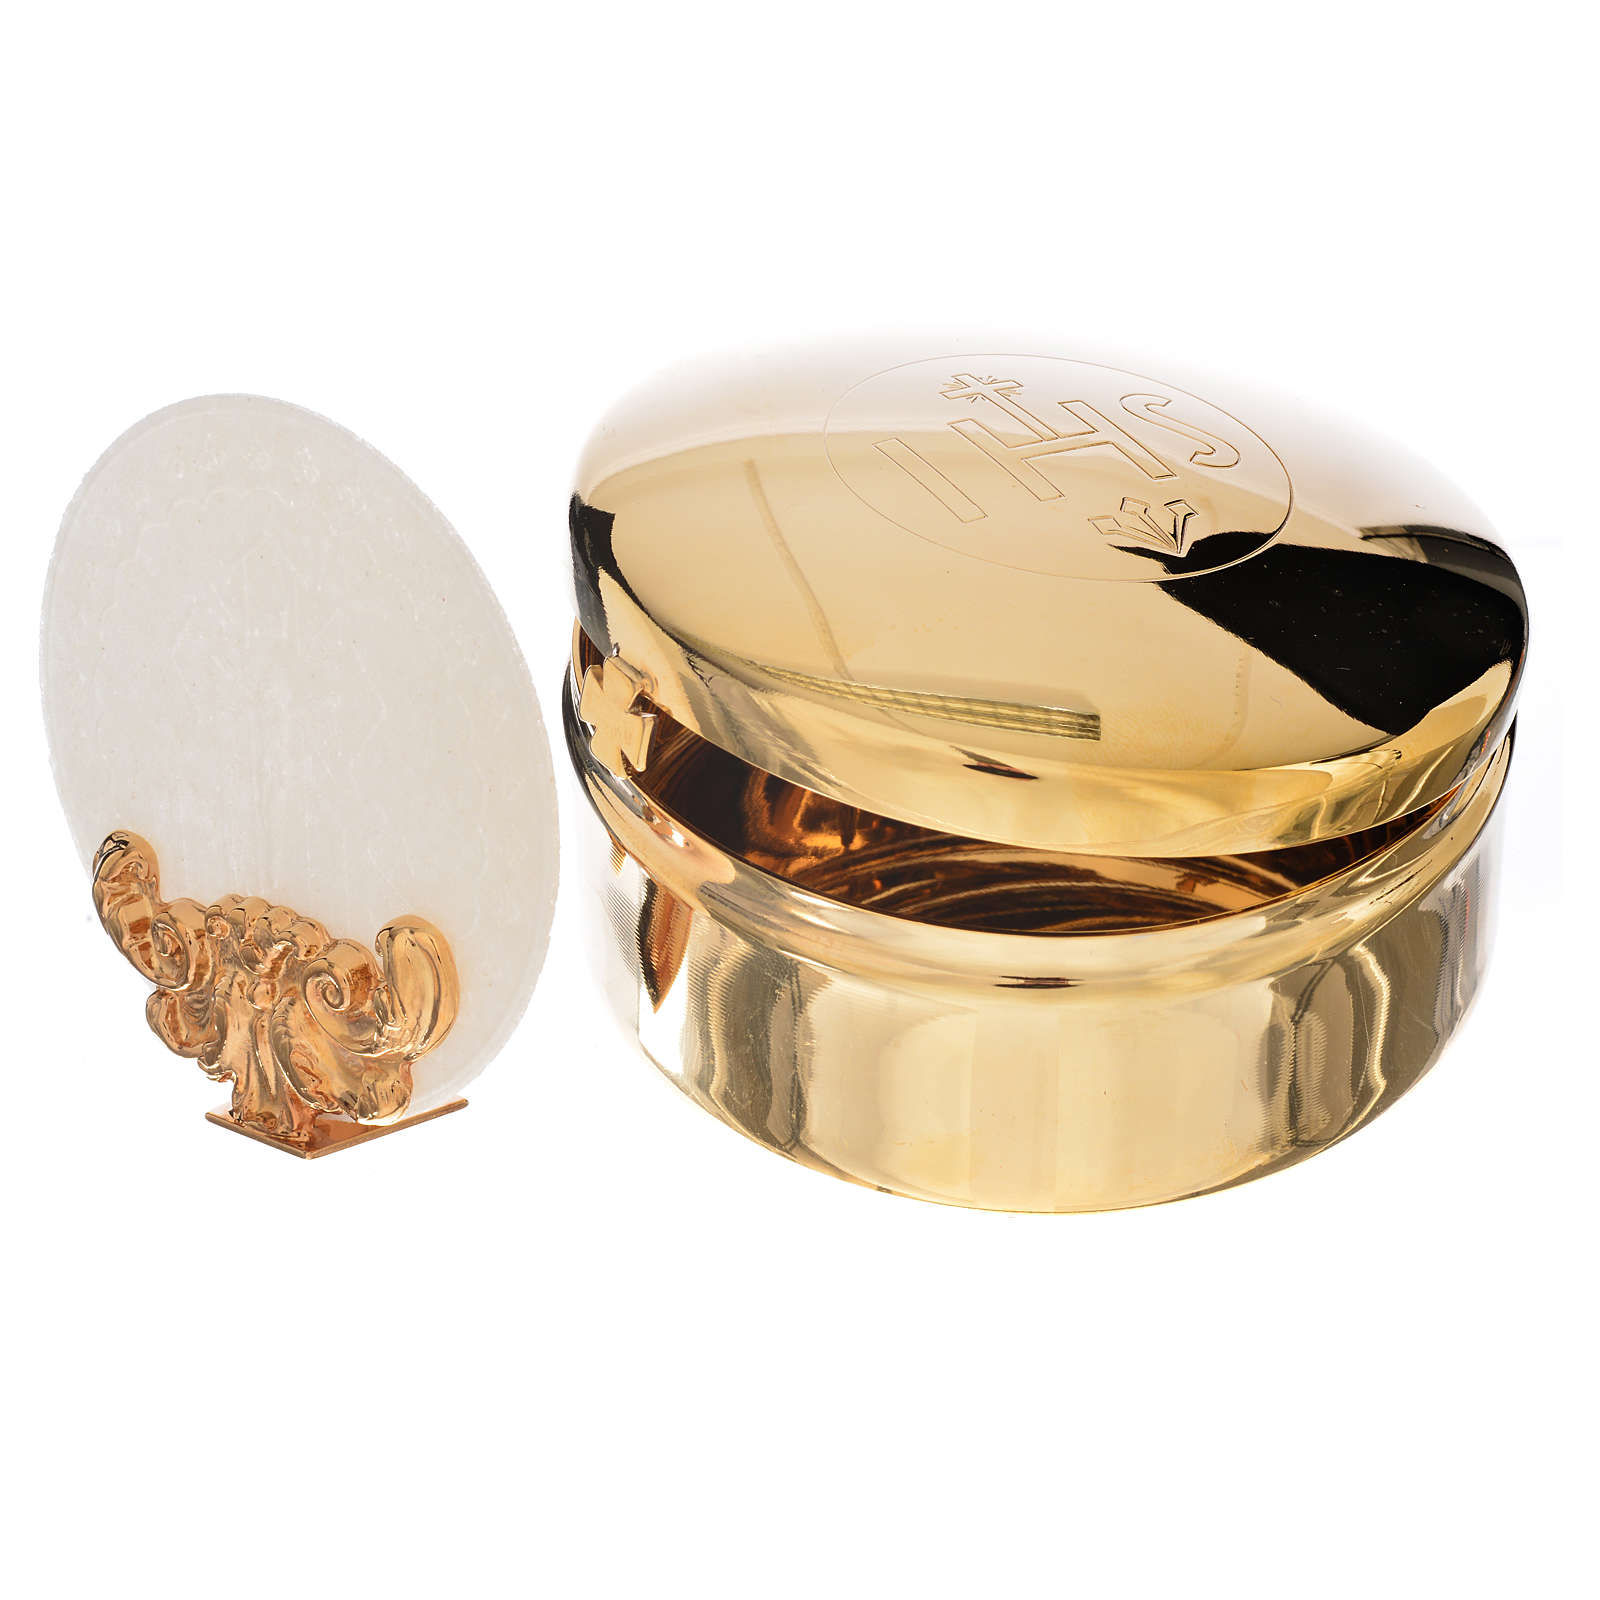 Host box in brass, 9.5cm diameter 4